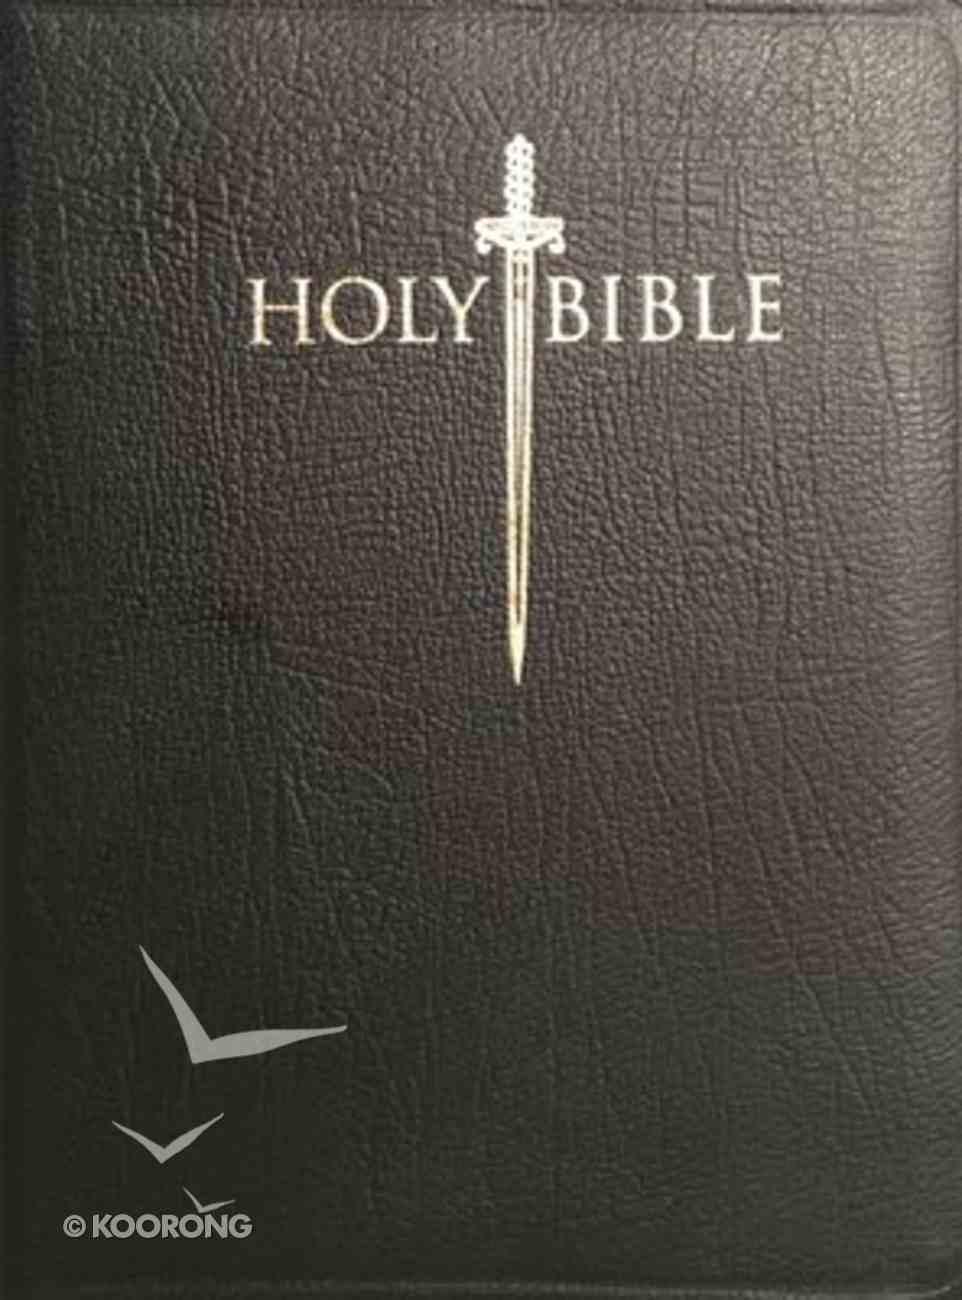 KJV Sword Study Personal Size Giant Print Bible Genuine Black Leather Genuine Leather